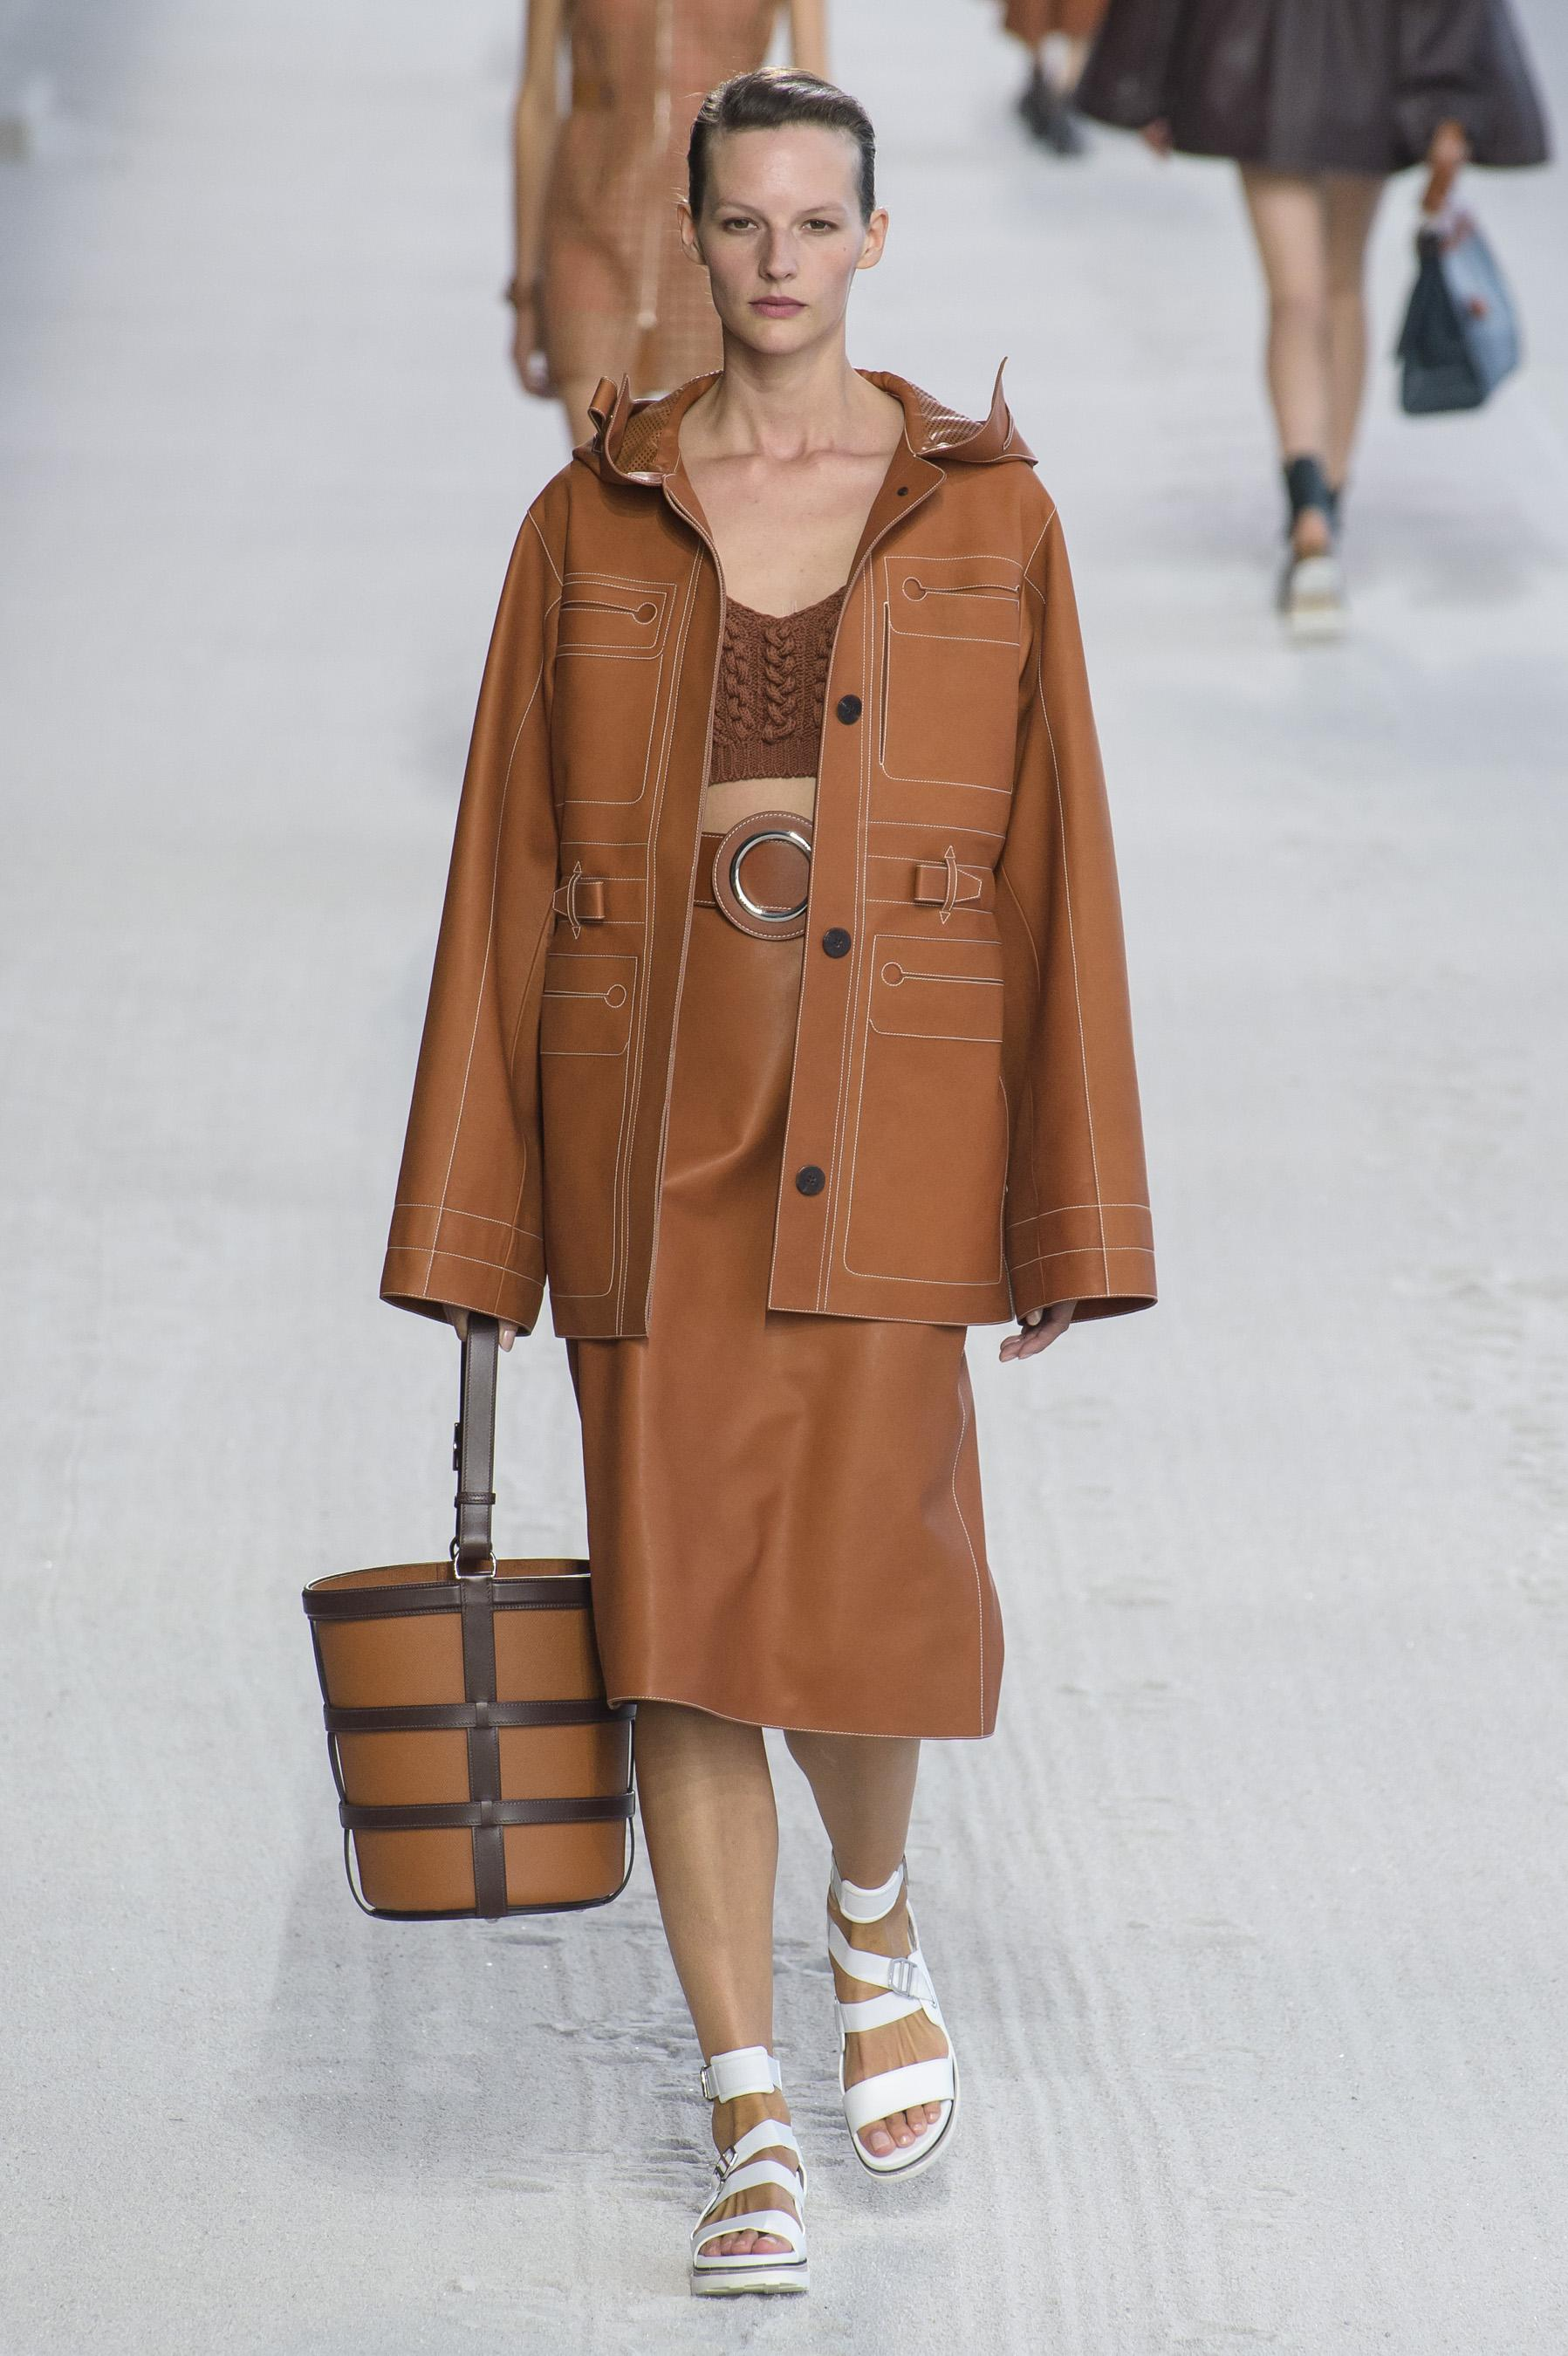 21edb6fb73e Défilé Hermès printemps-été 2019 Prêt-à-porter - Madame Figaro